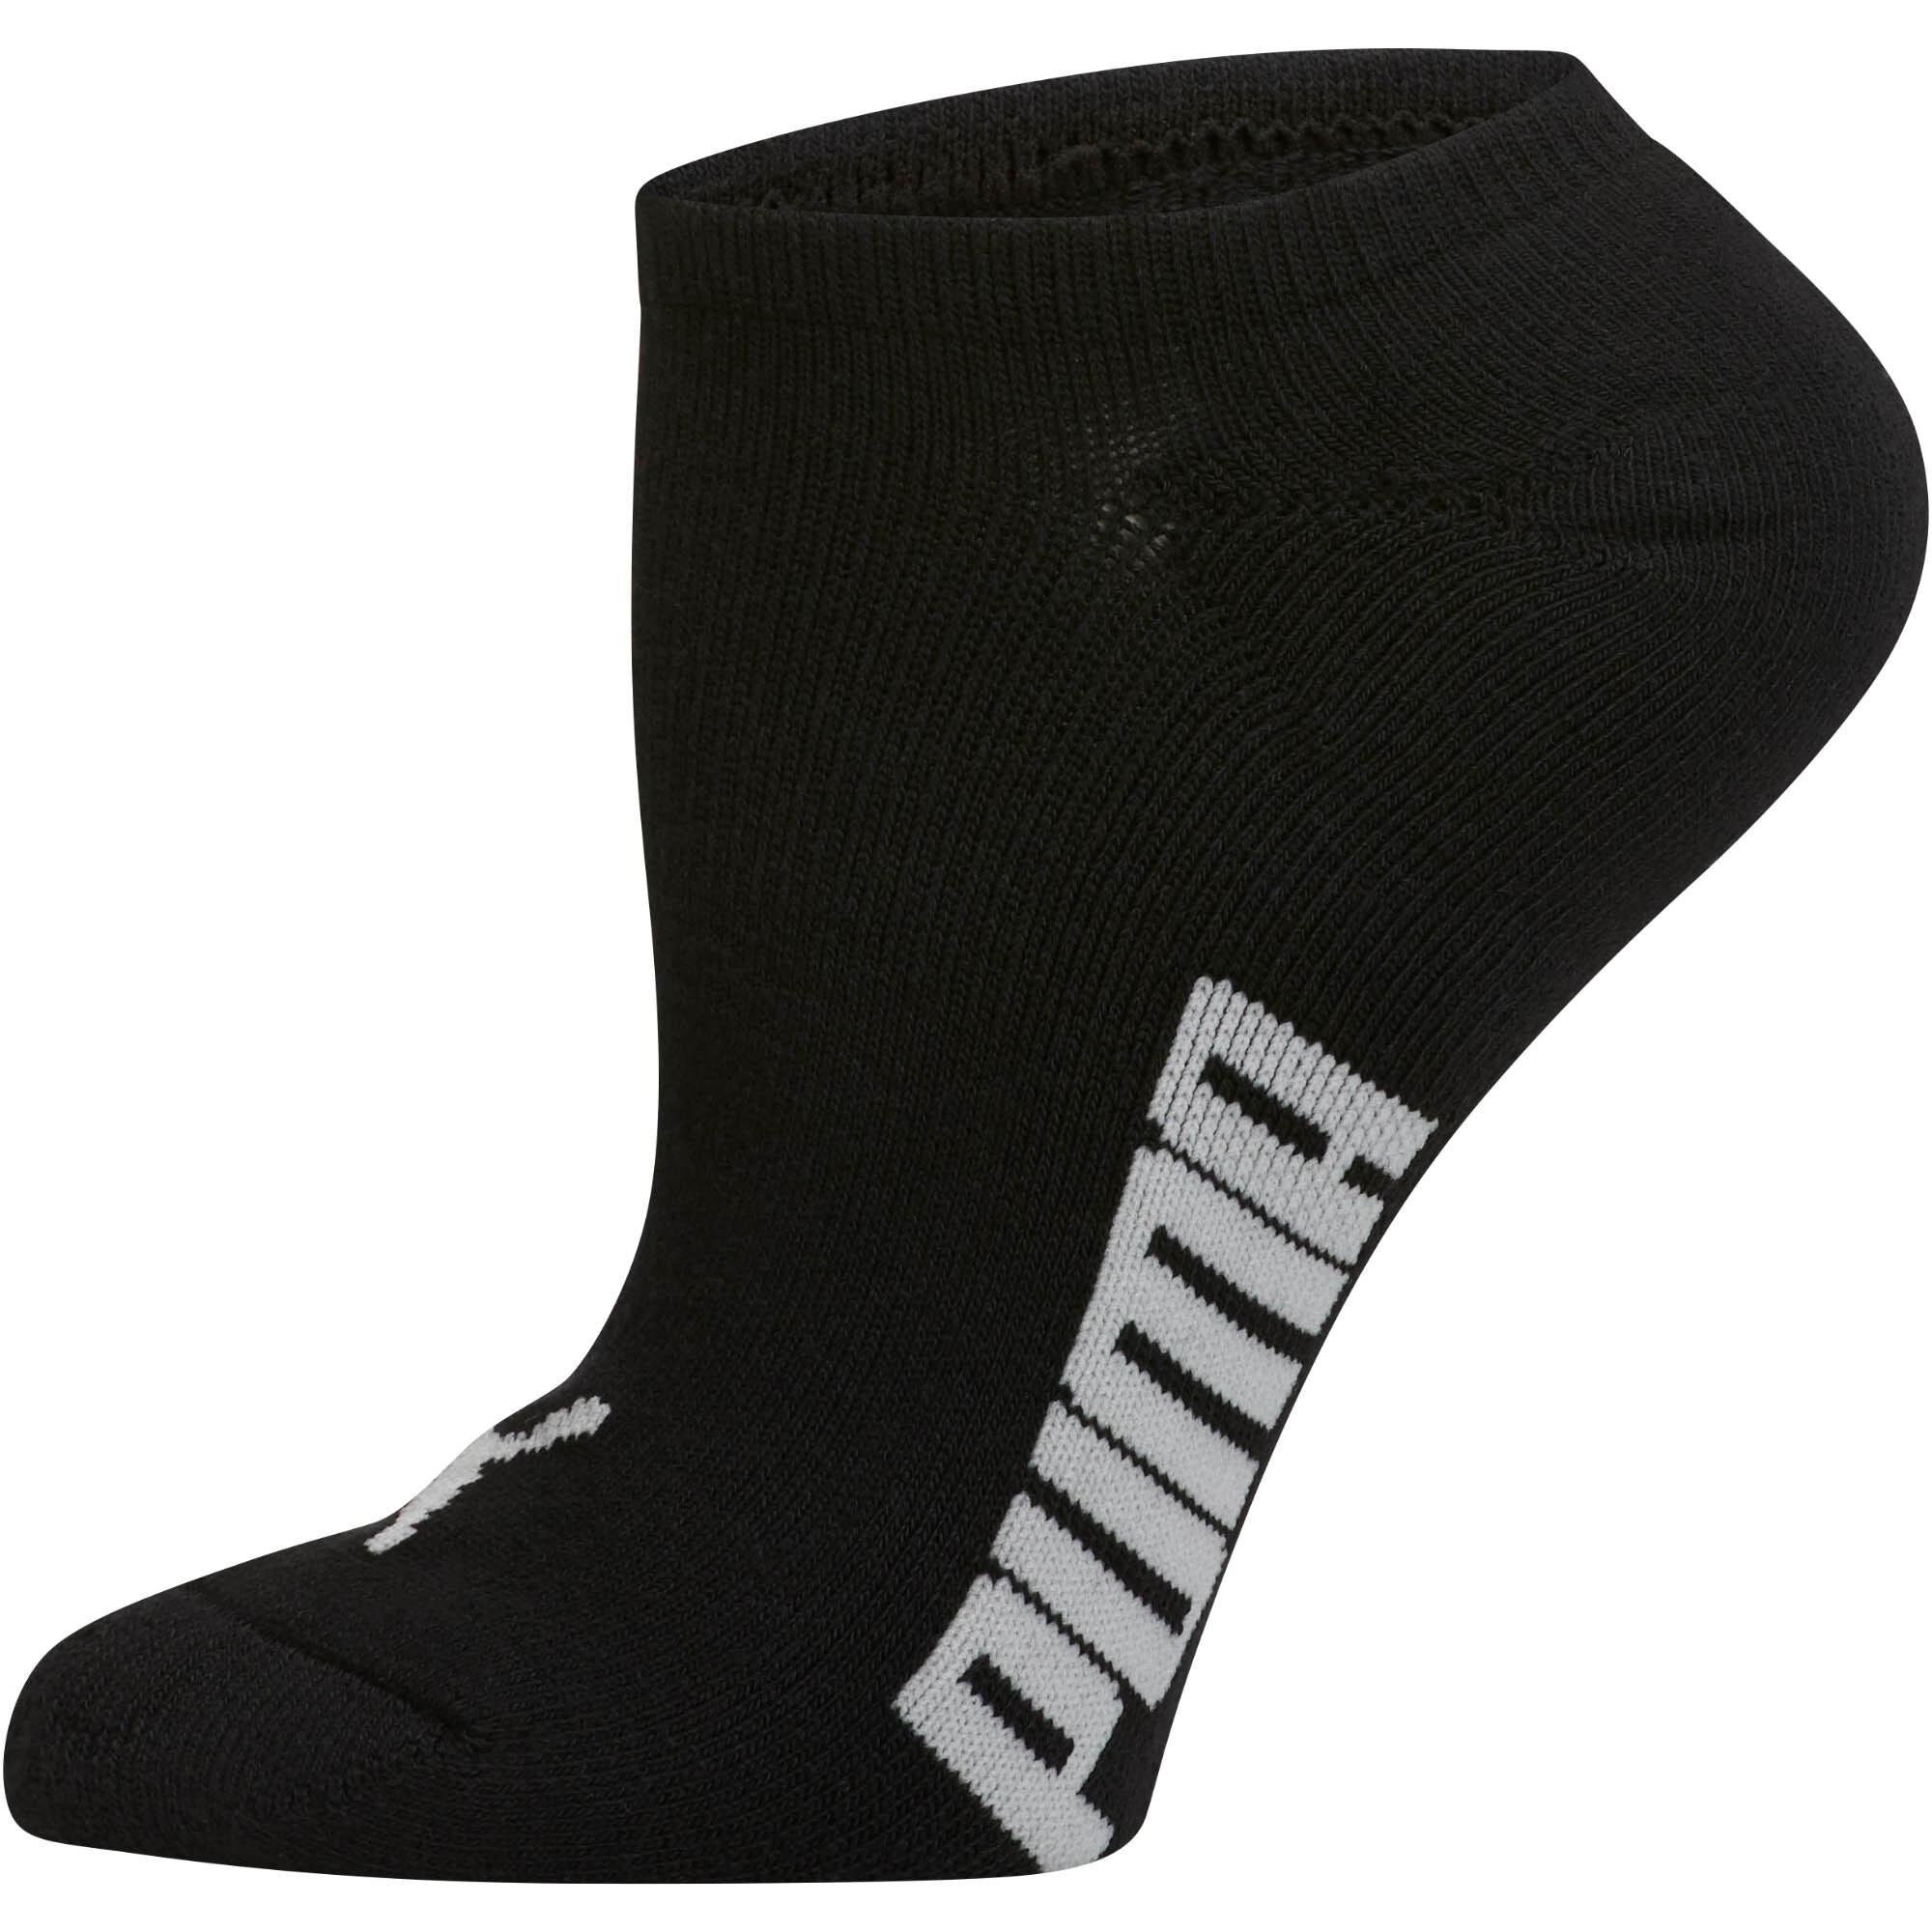 Licence-Women-s-Invisible-No-Show-Socks-3-Pack-Women-Socks-3-Pack thumbnail 12